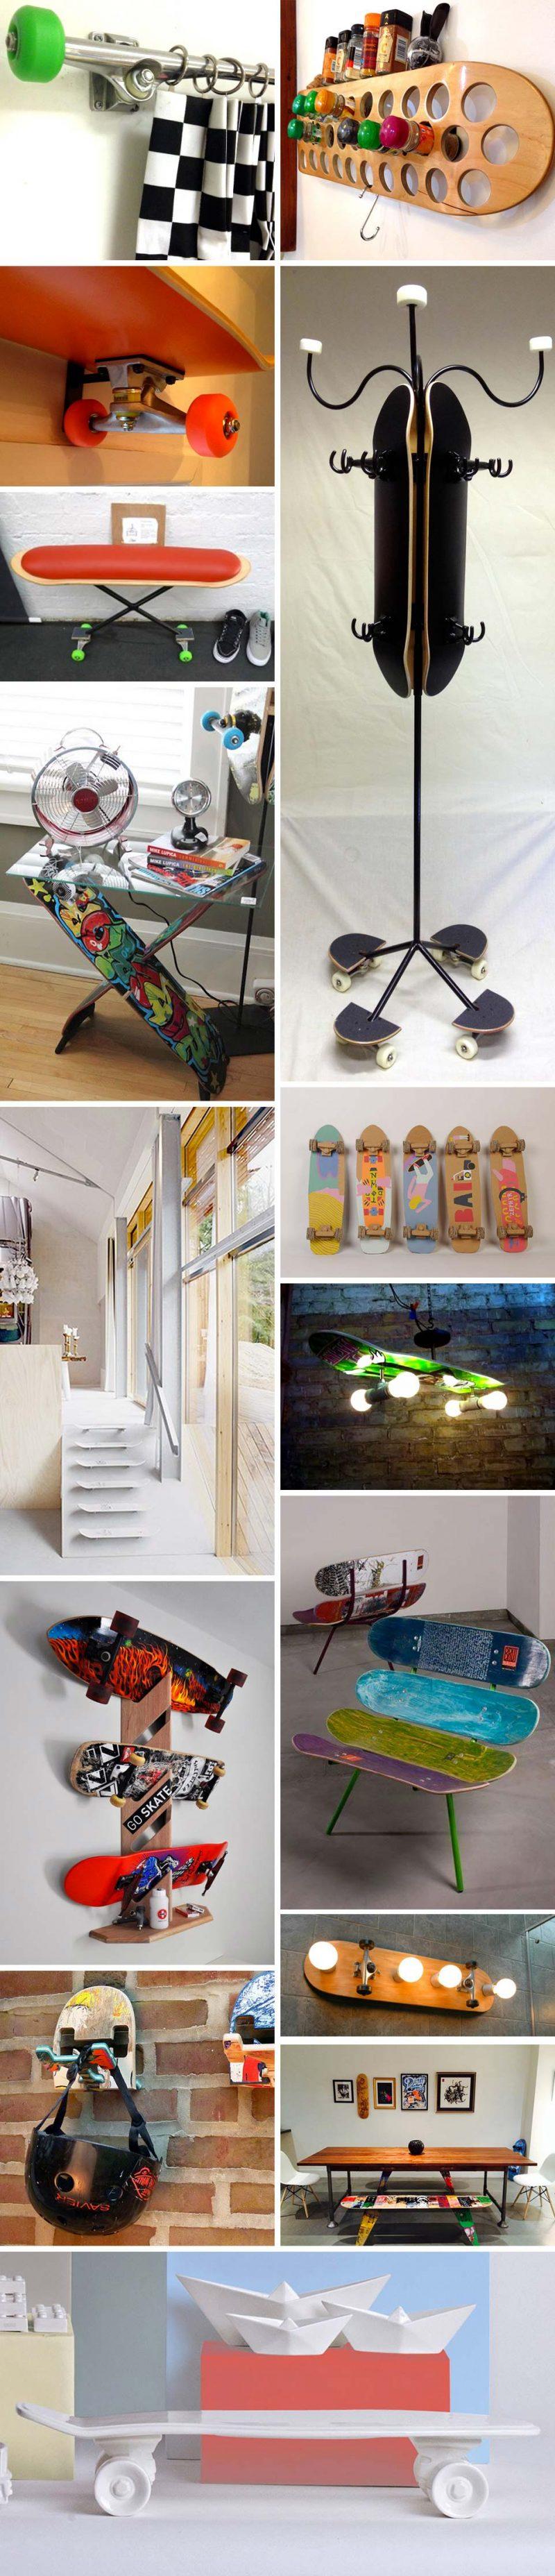 Idees decoration skateboard 00200 800x3712.jpg